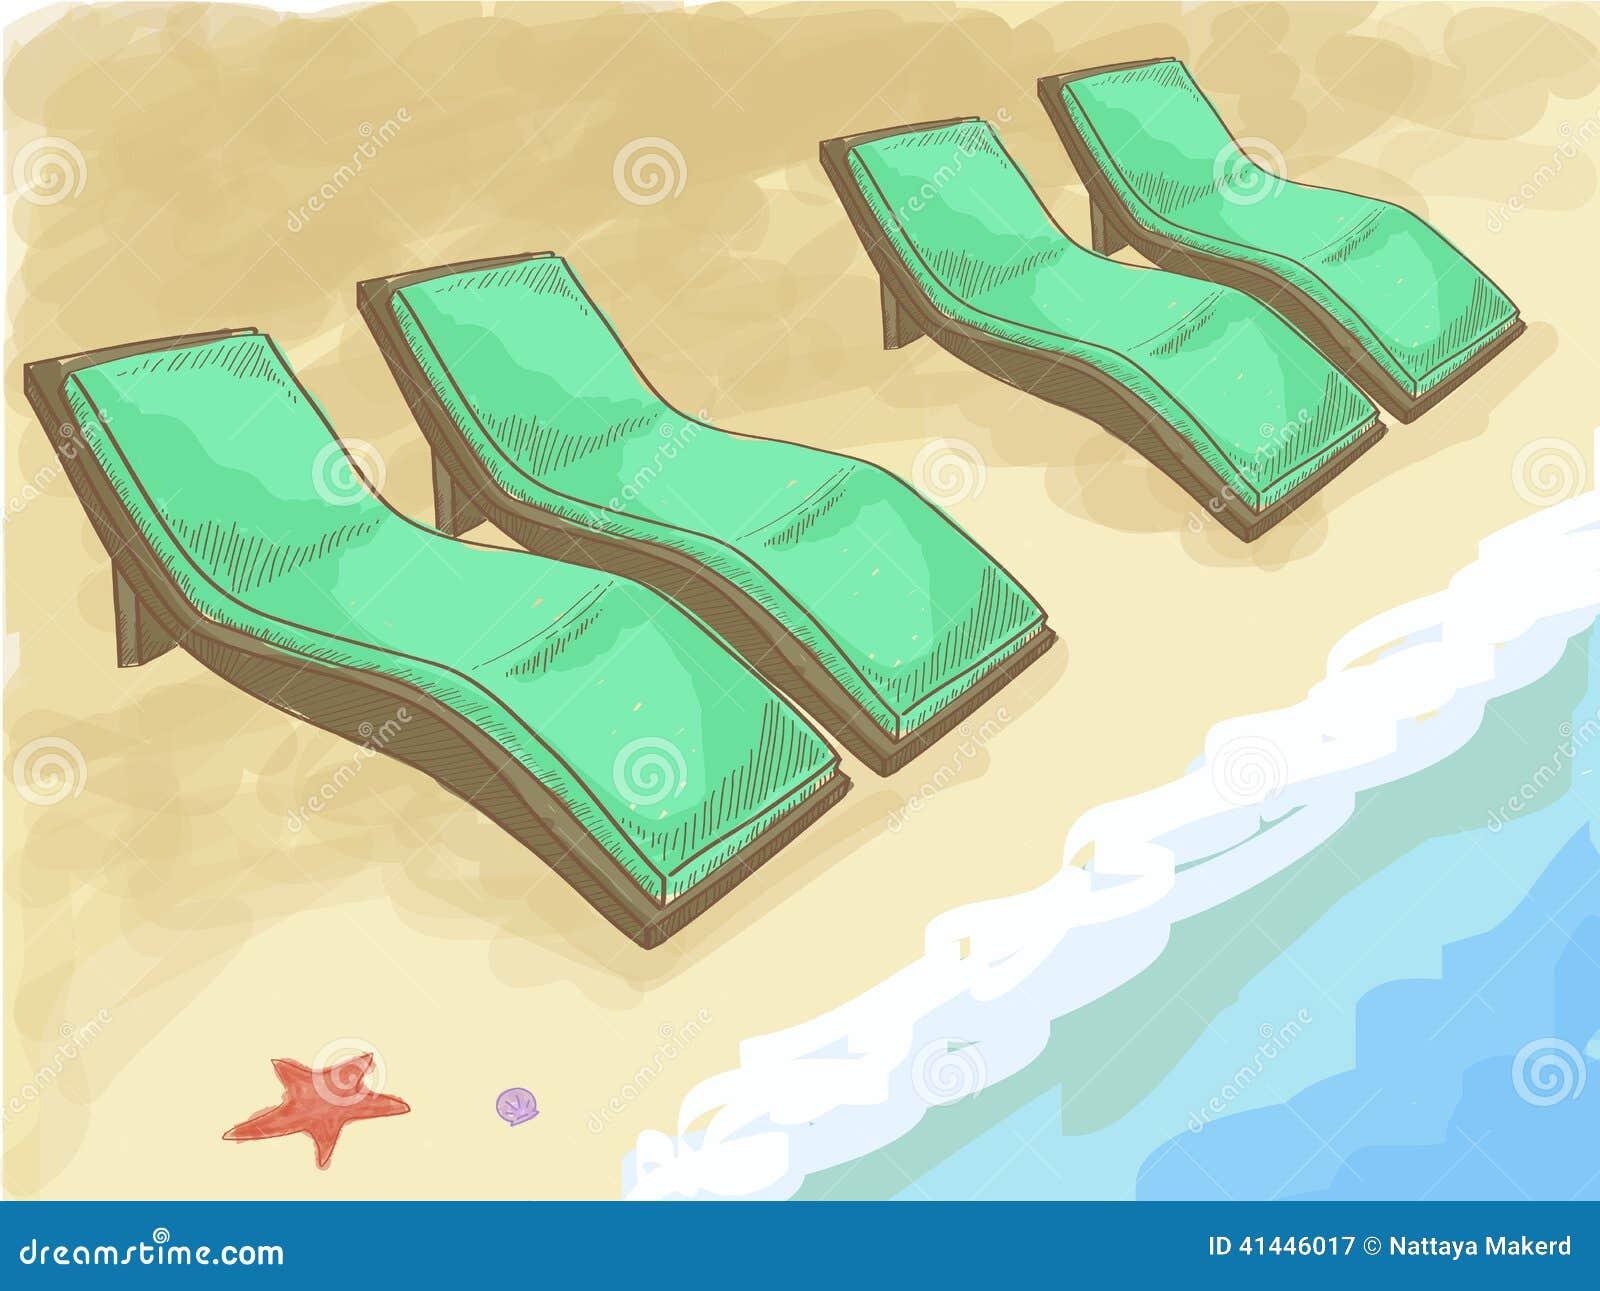 Beach Chair Sketch Stock Illustrations 584 Beach Chair Sketch Stock Illustrations Vectors Clipart Dreamstime